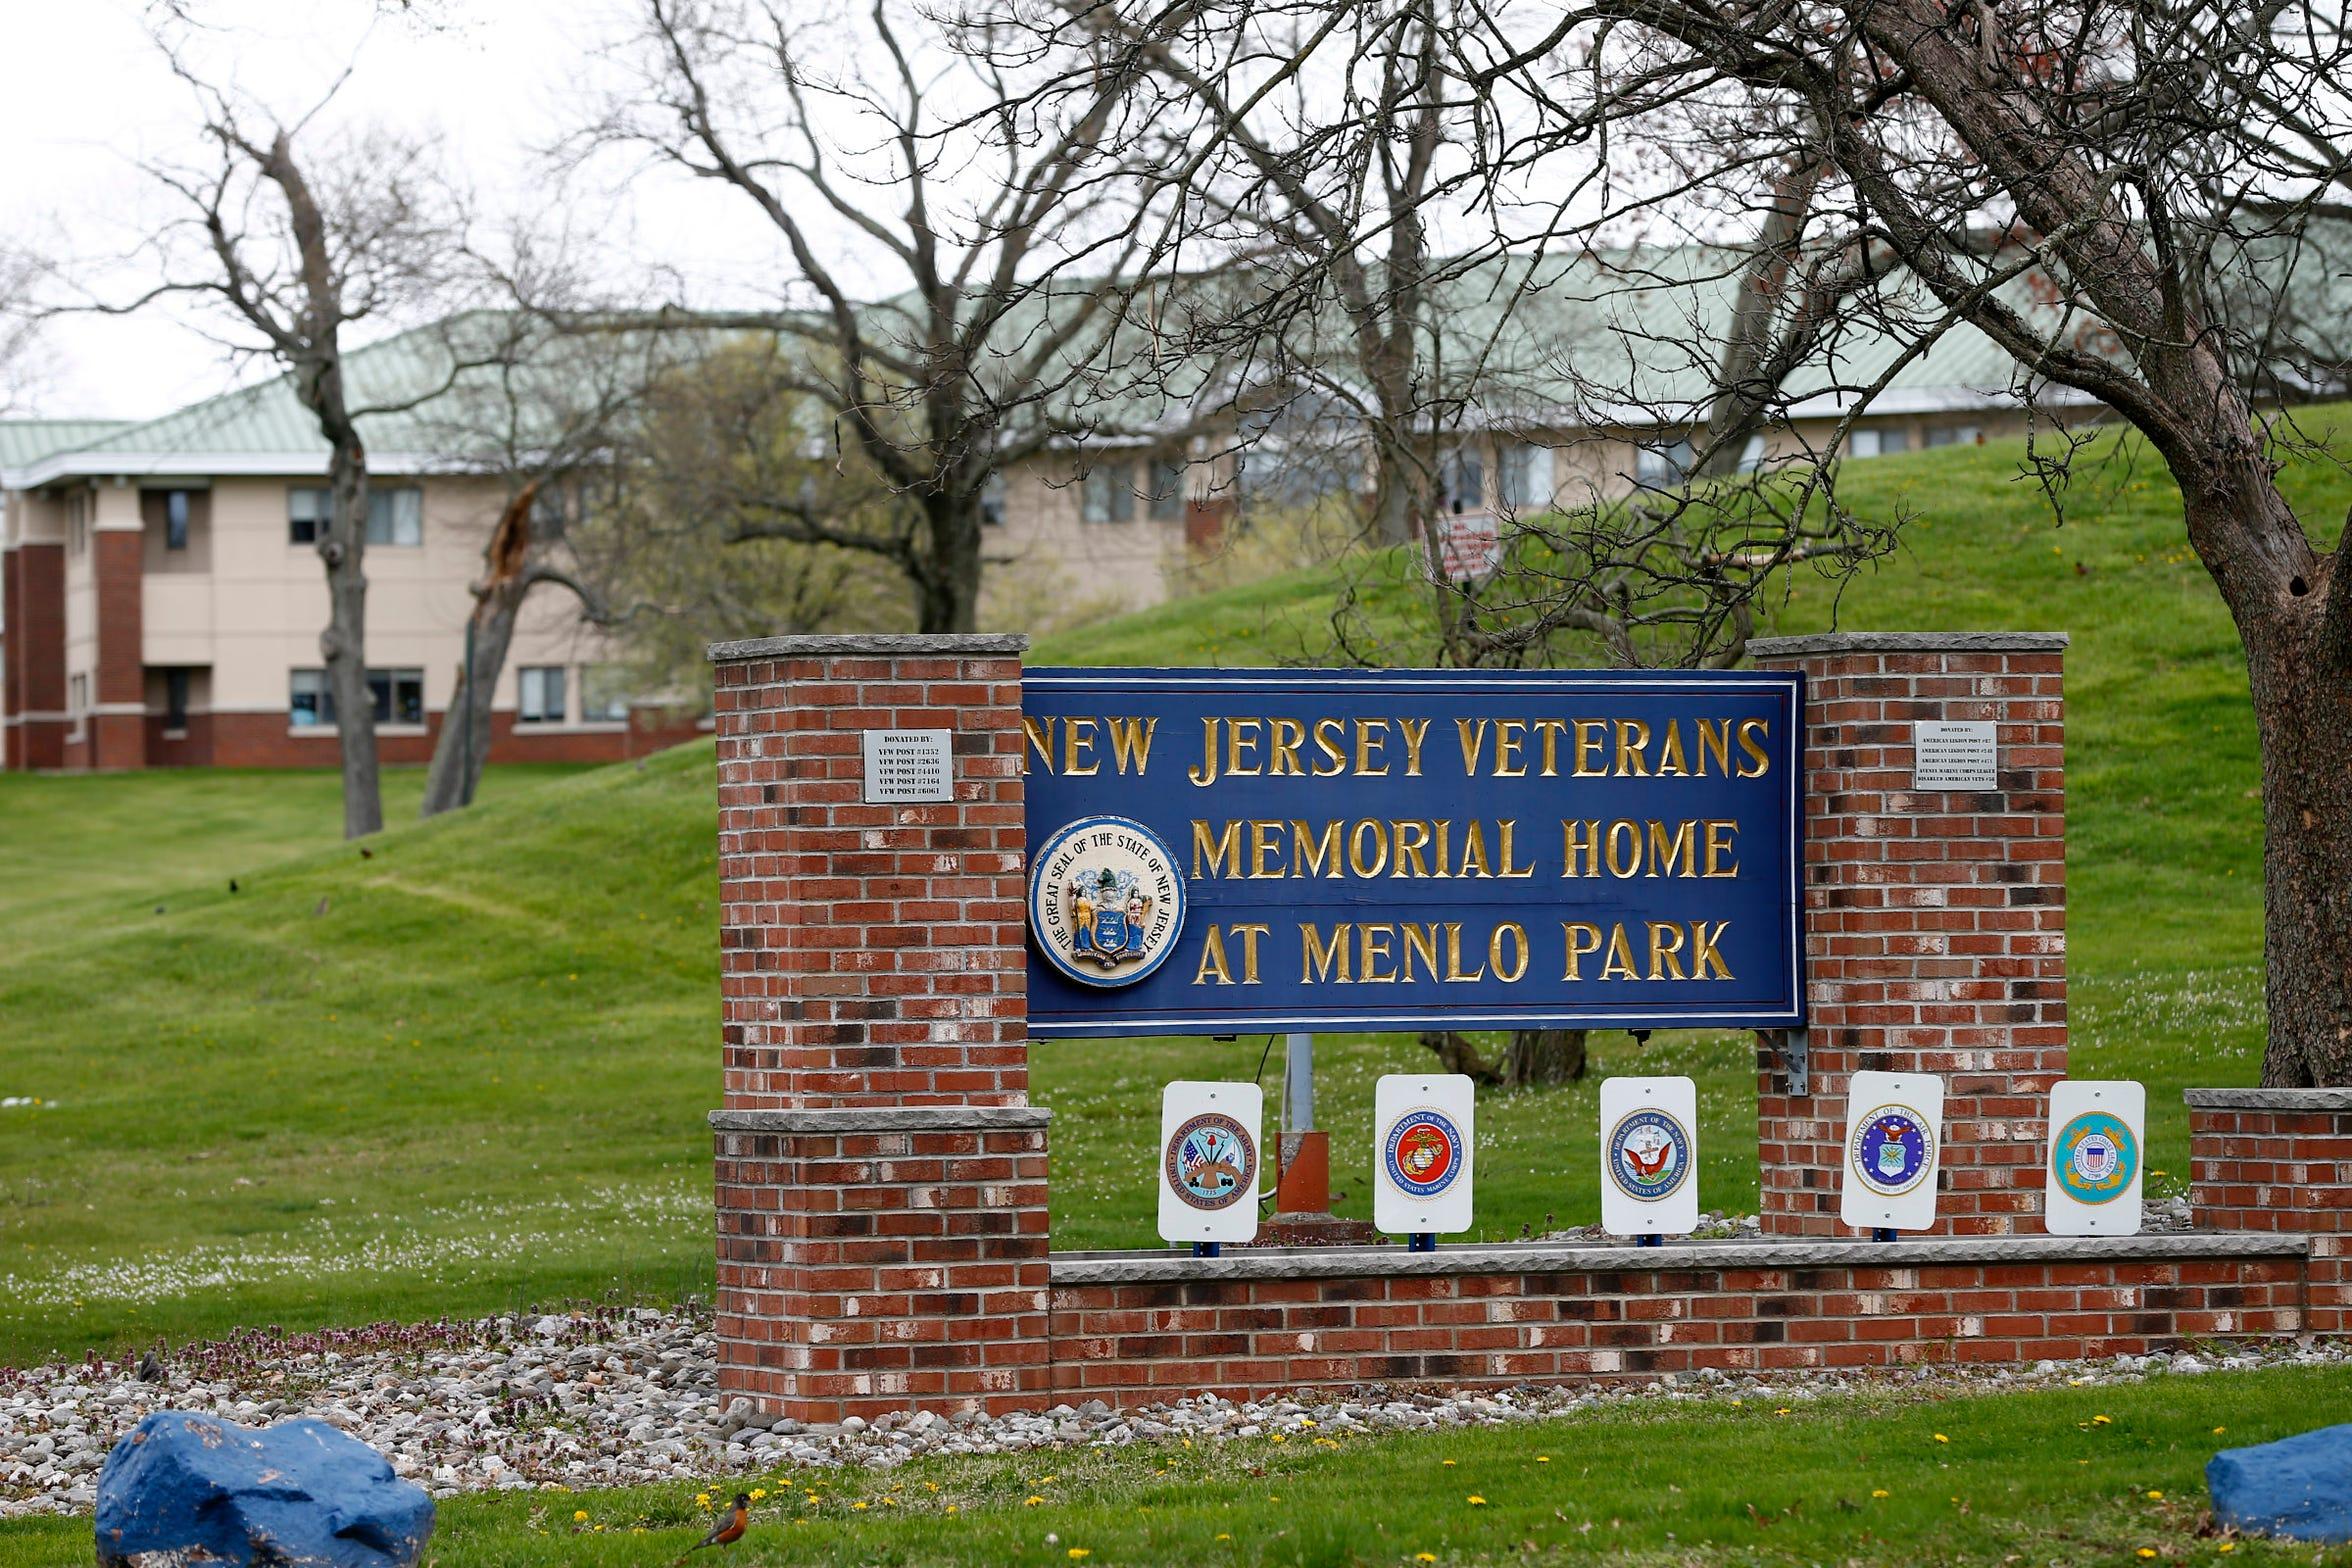 The NJ Veterans Memorial Home at Menlo Park shown Friday, April 10, 2020.